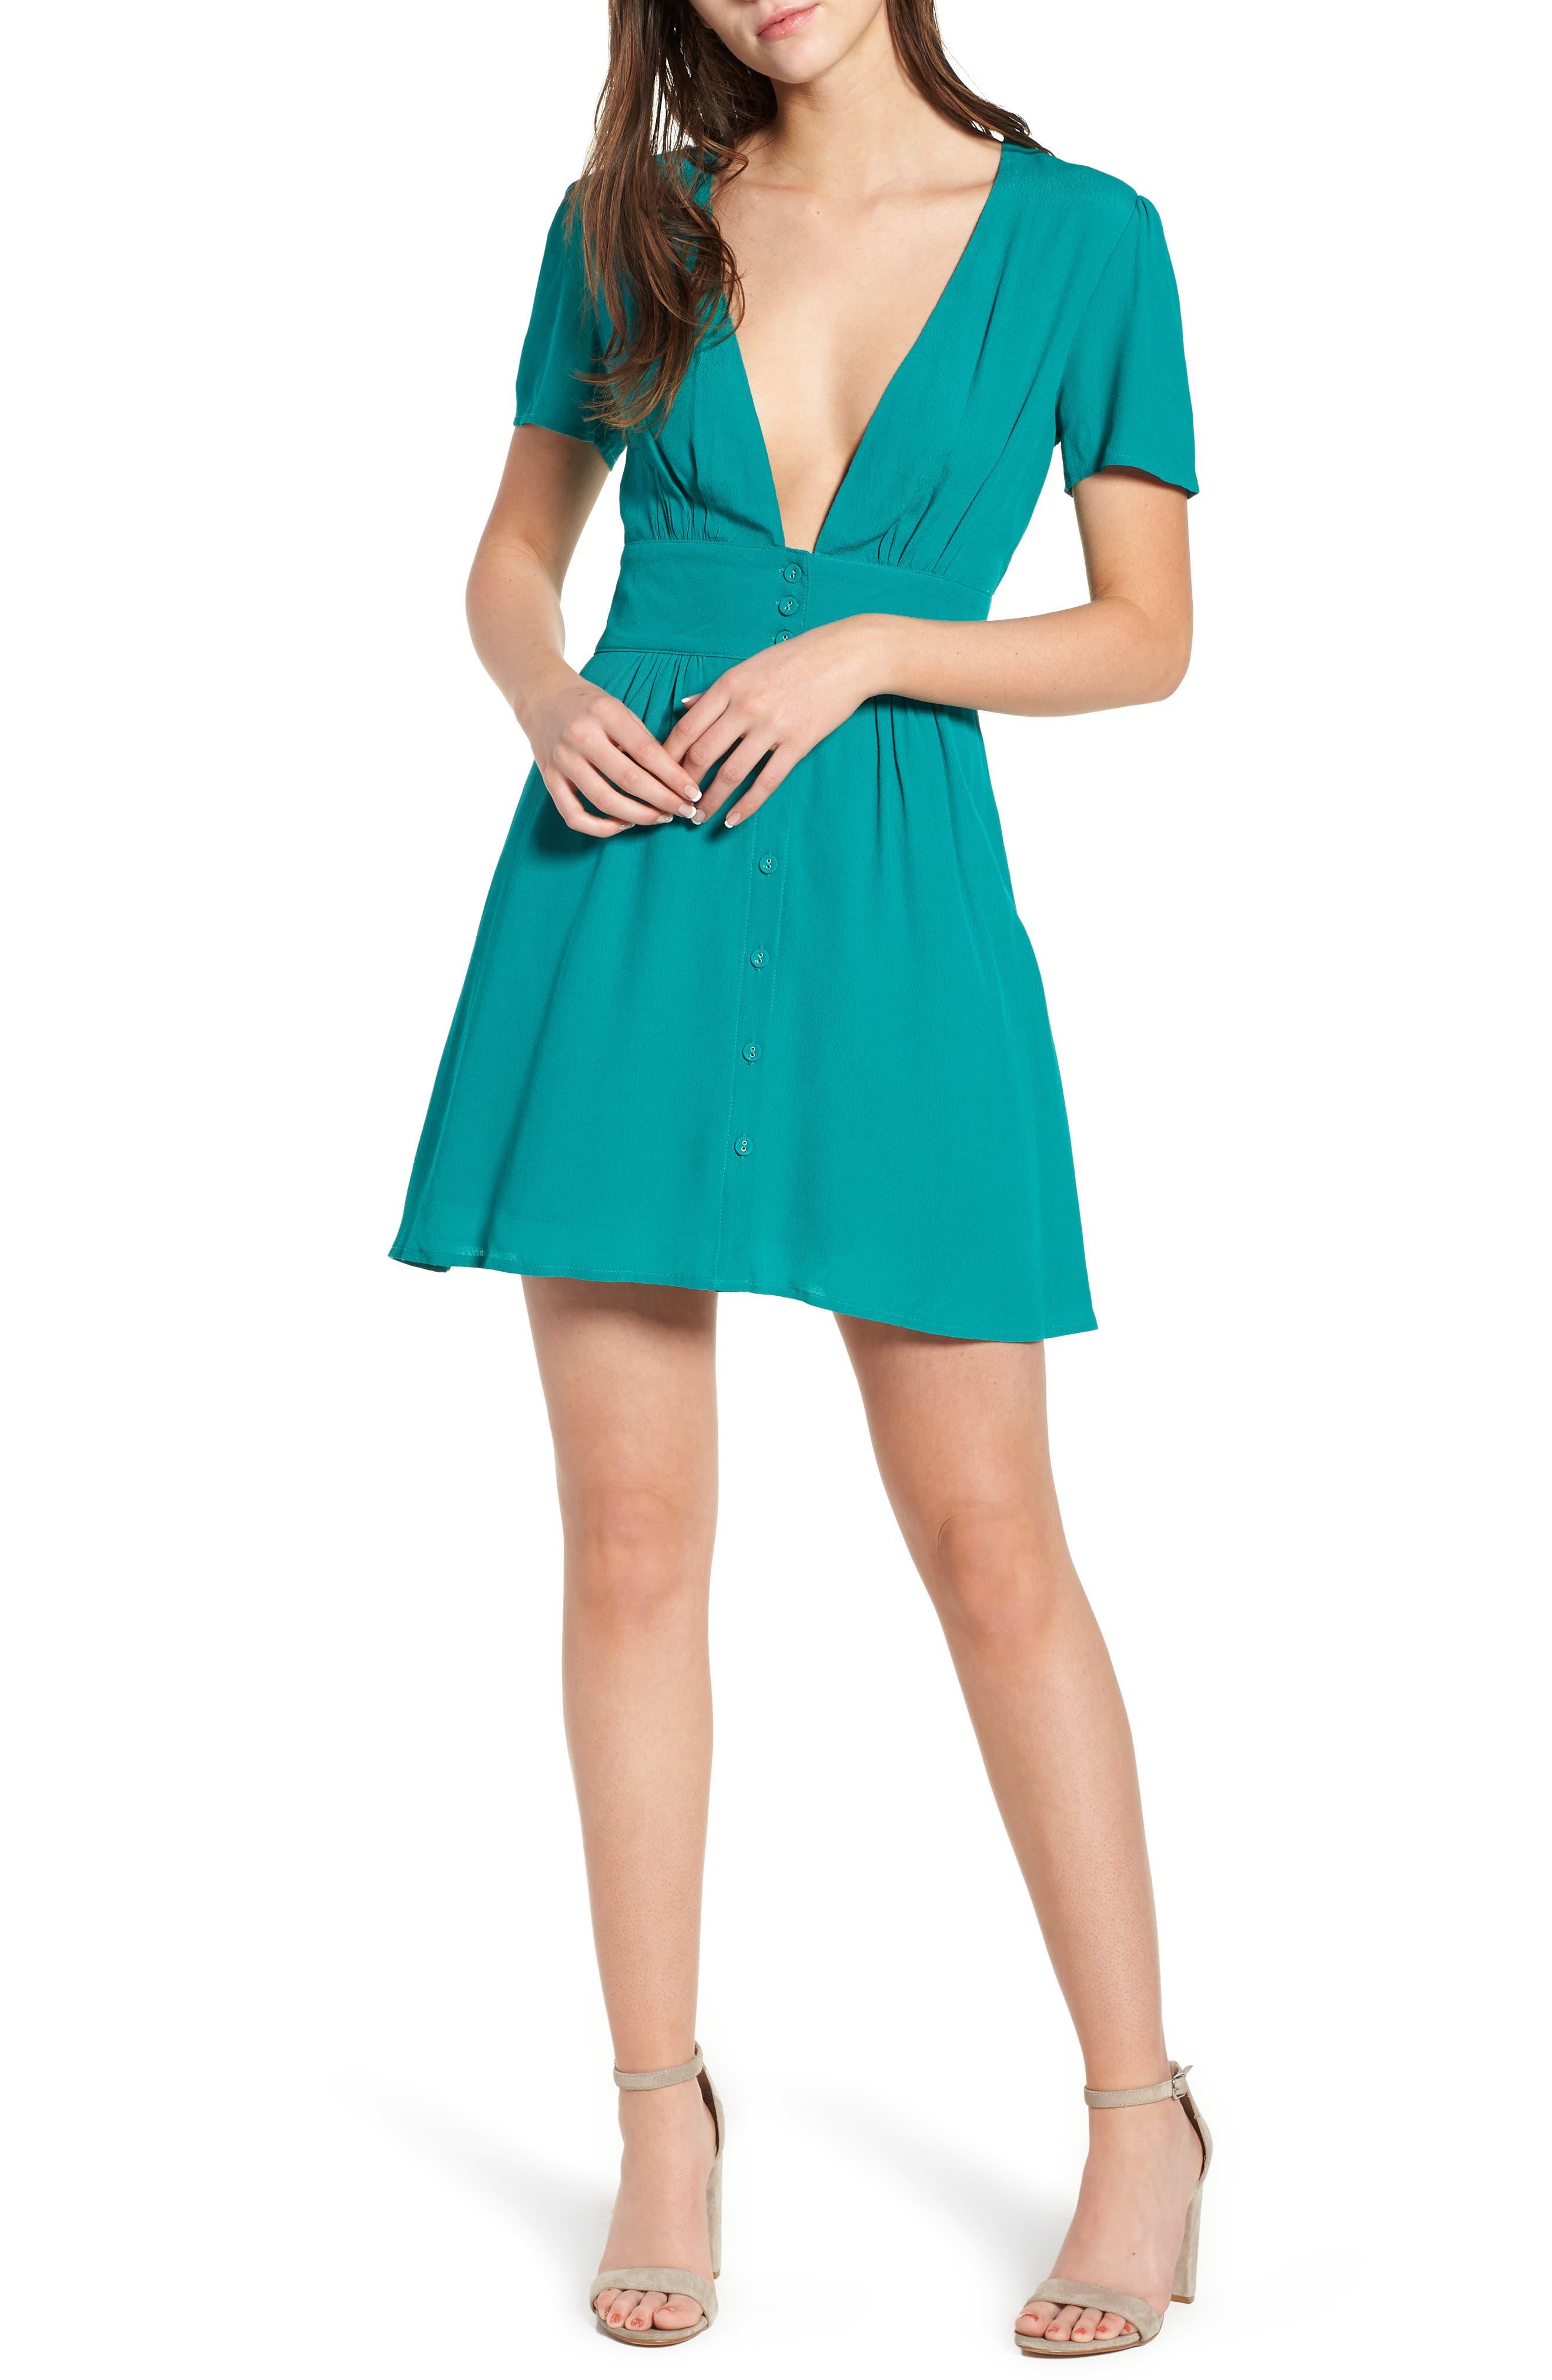 Verdera Plunging Minidress,                         Main,                         color, Green